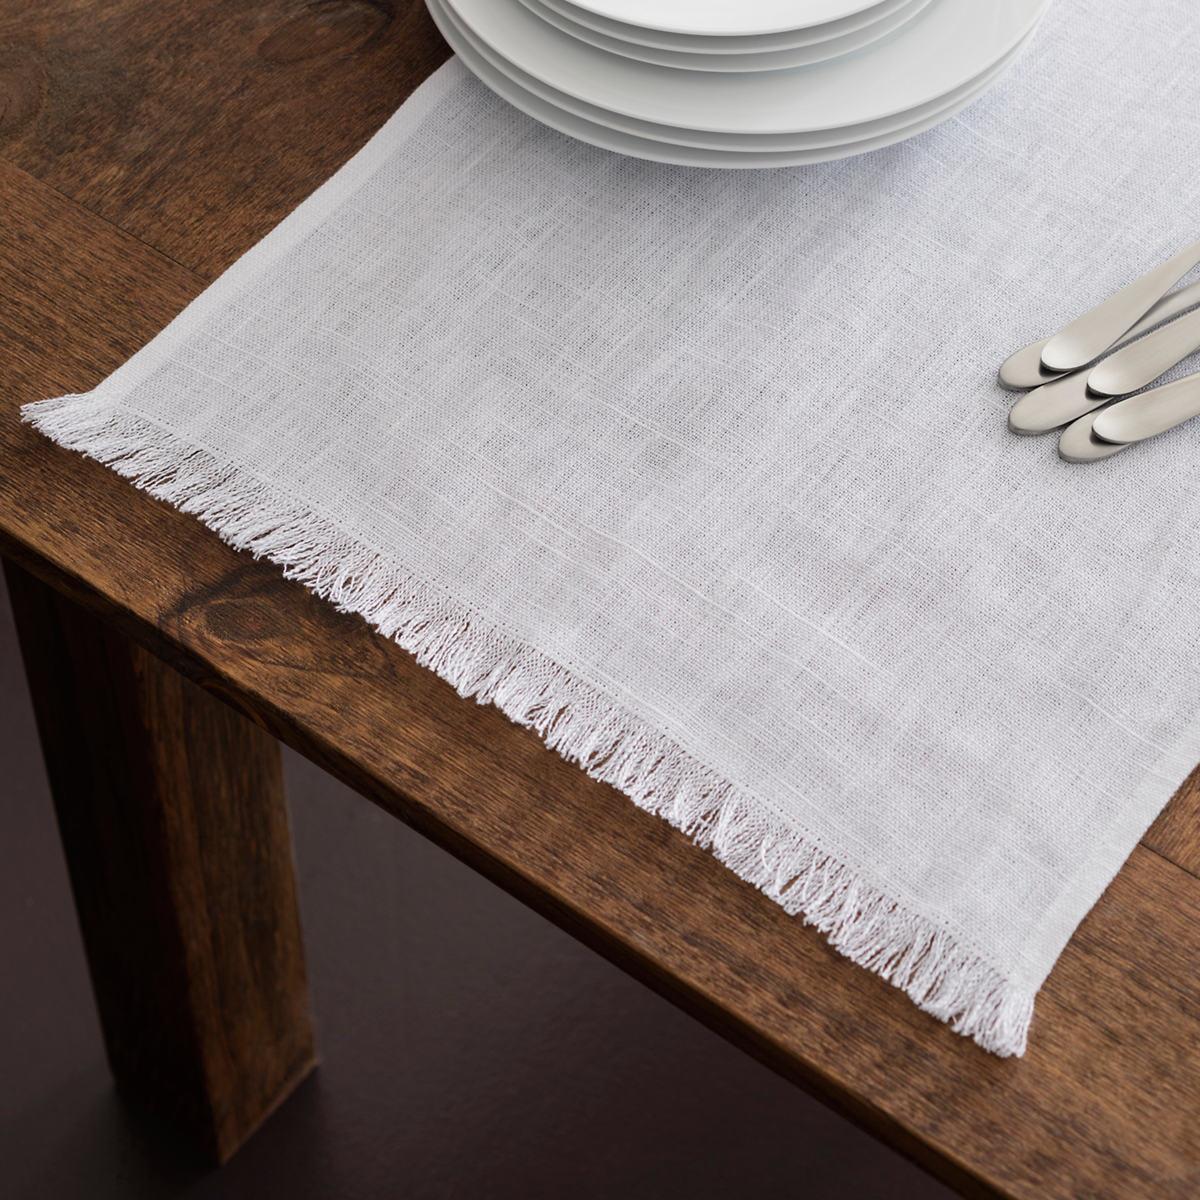 Wonderful Stone Washed Linen White Fringe Table Runner